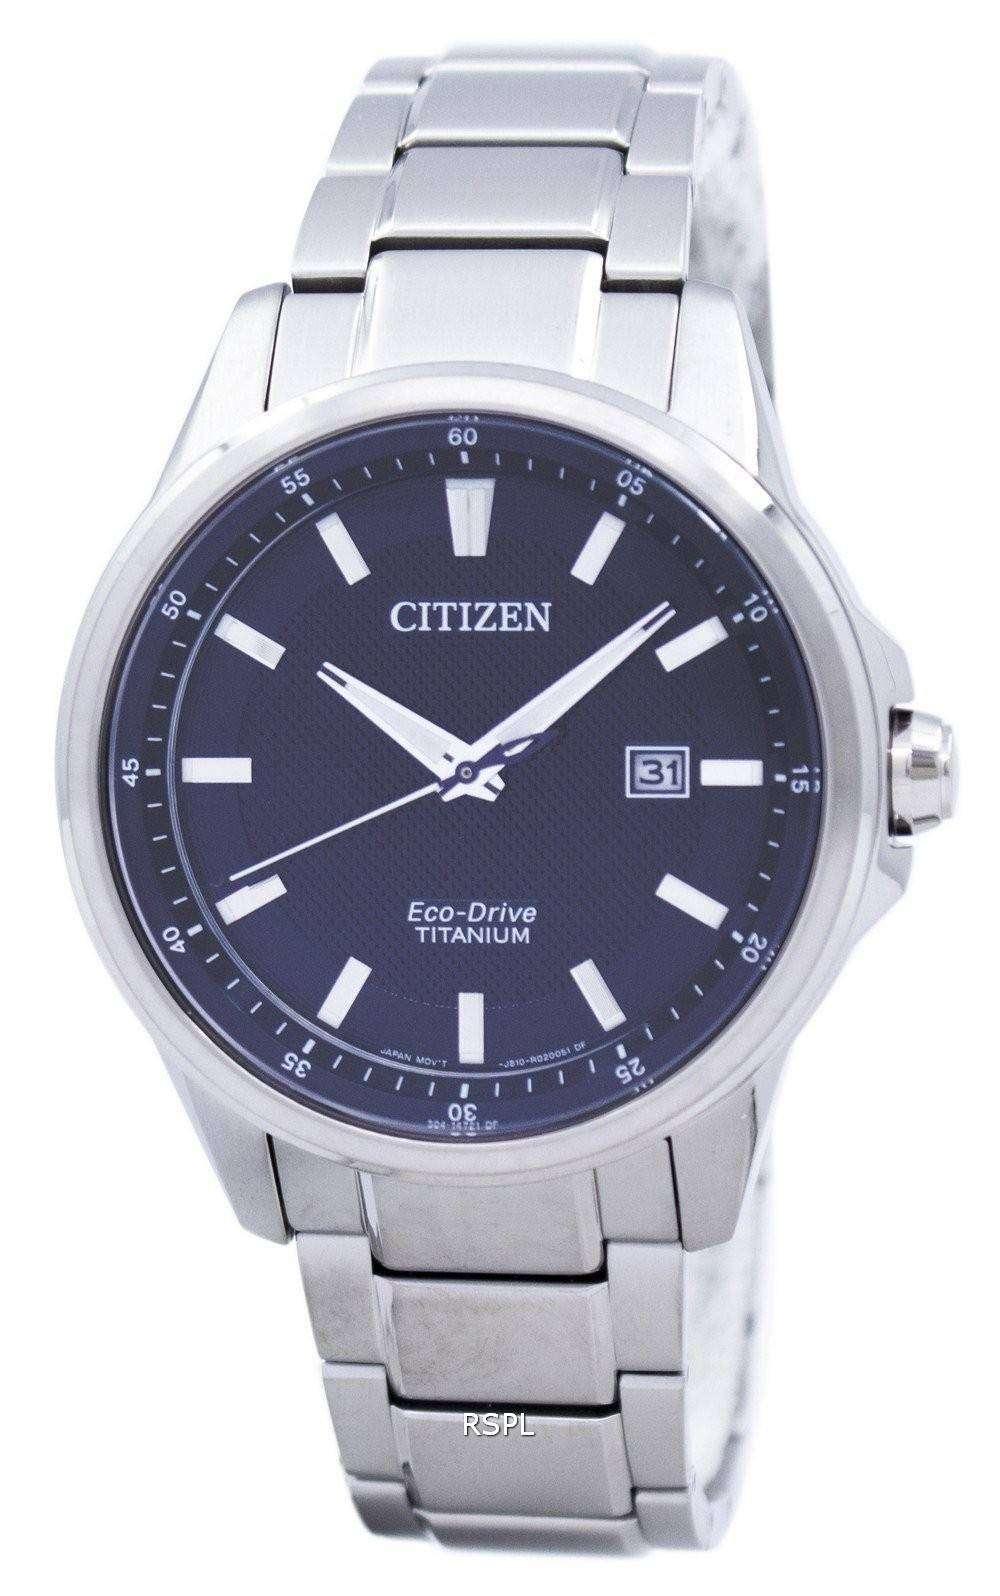 Citizen Eco-Drive Titanium Analog AW1490-84E Men's Watch ...